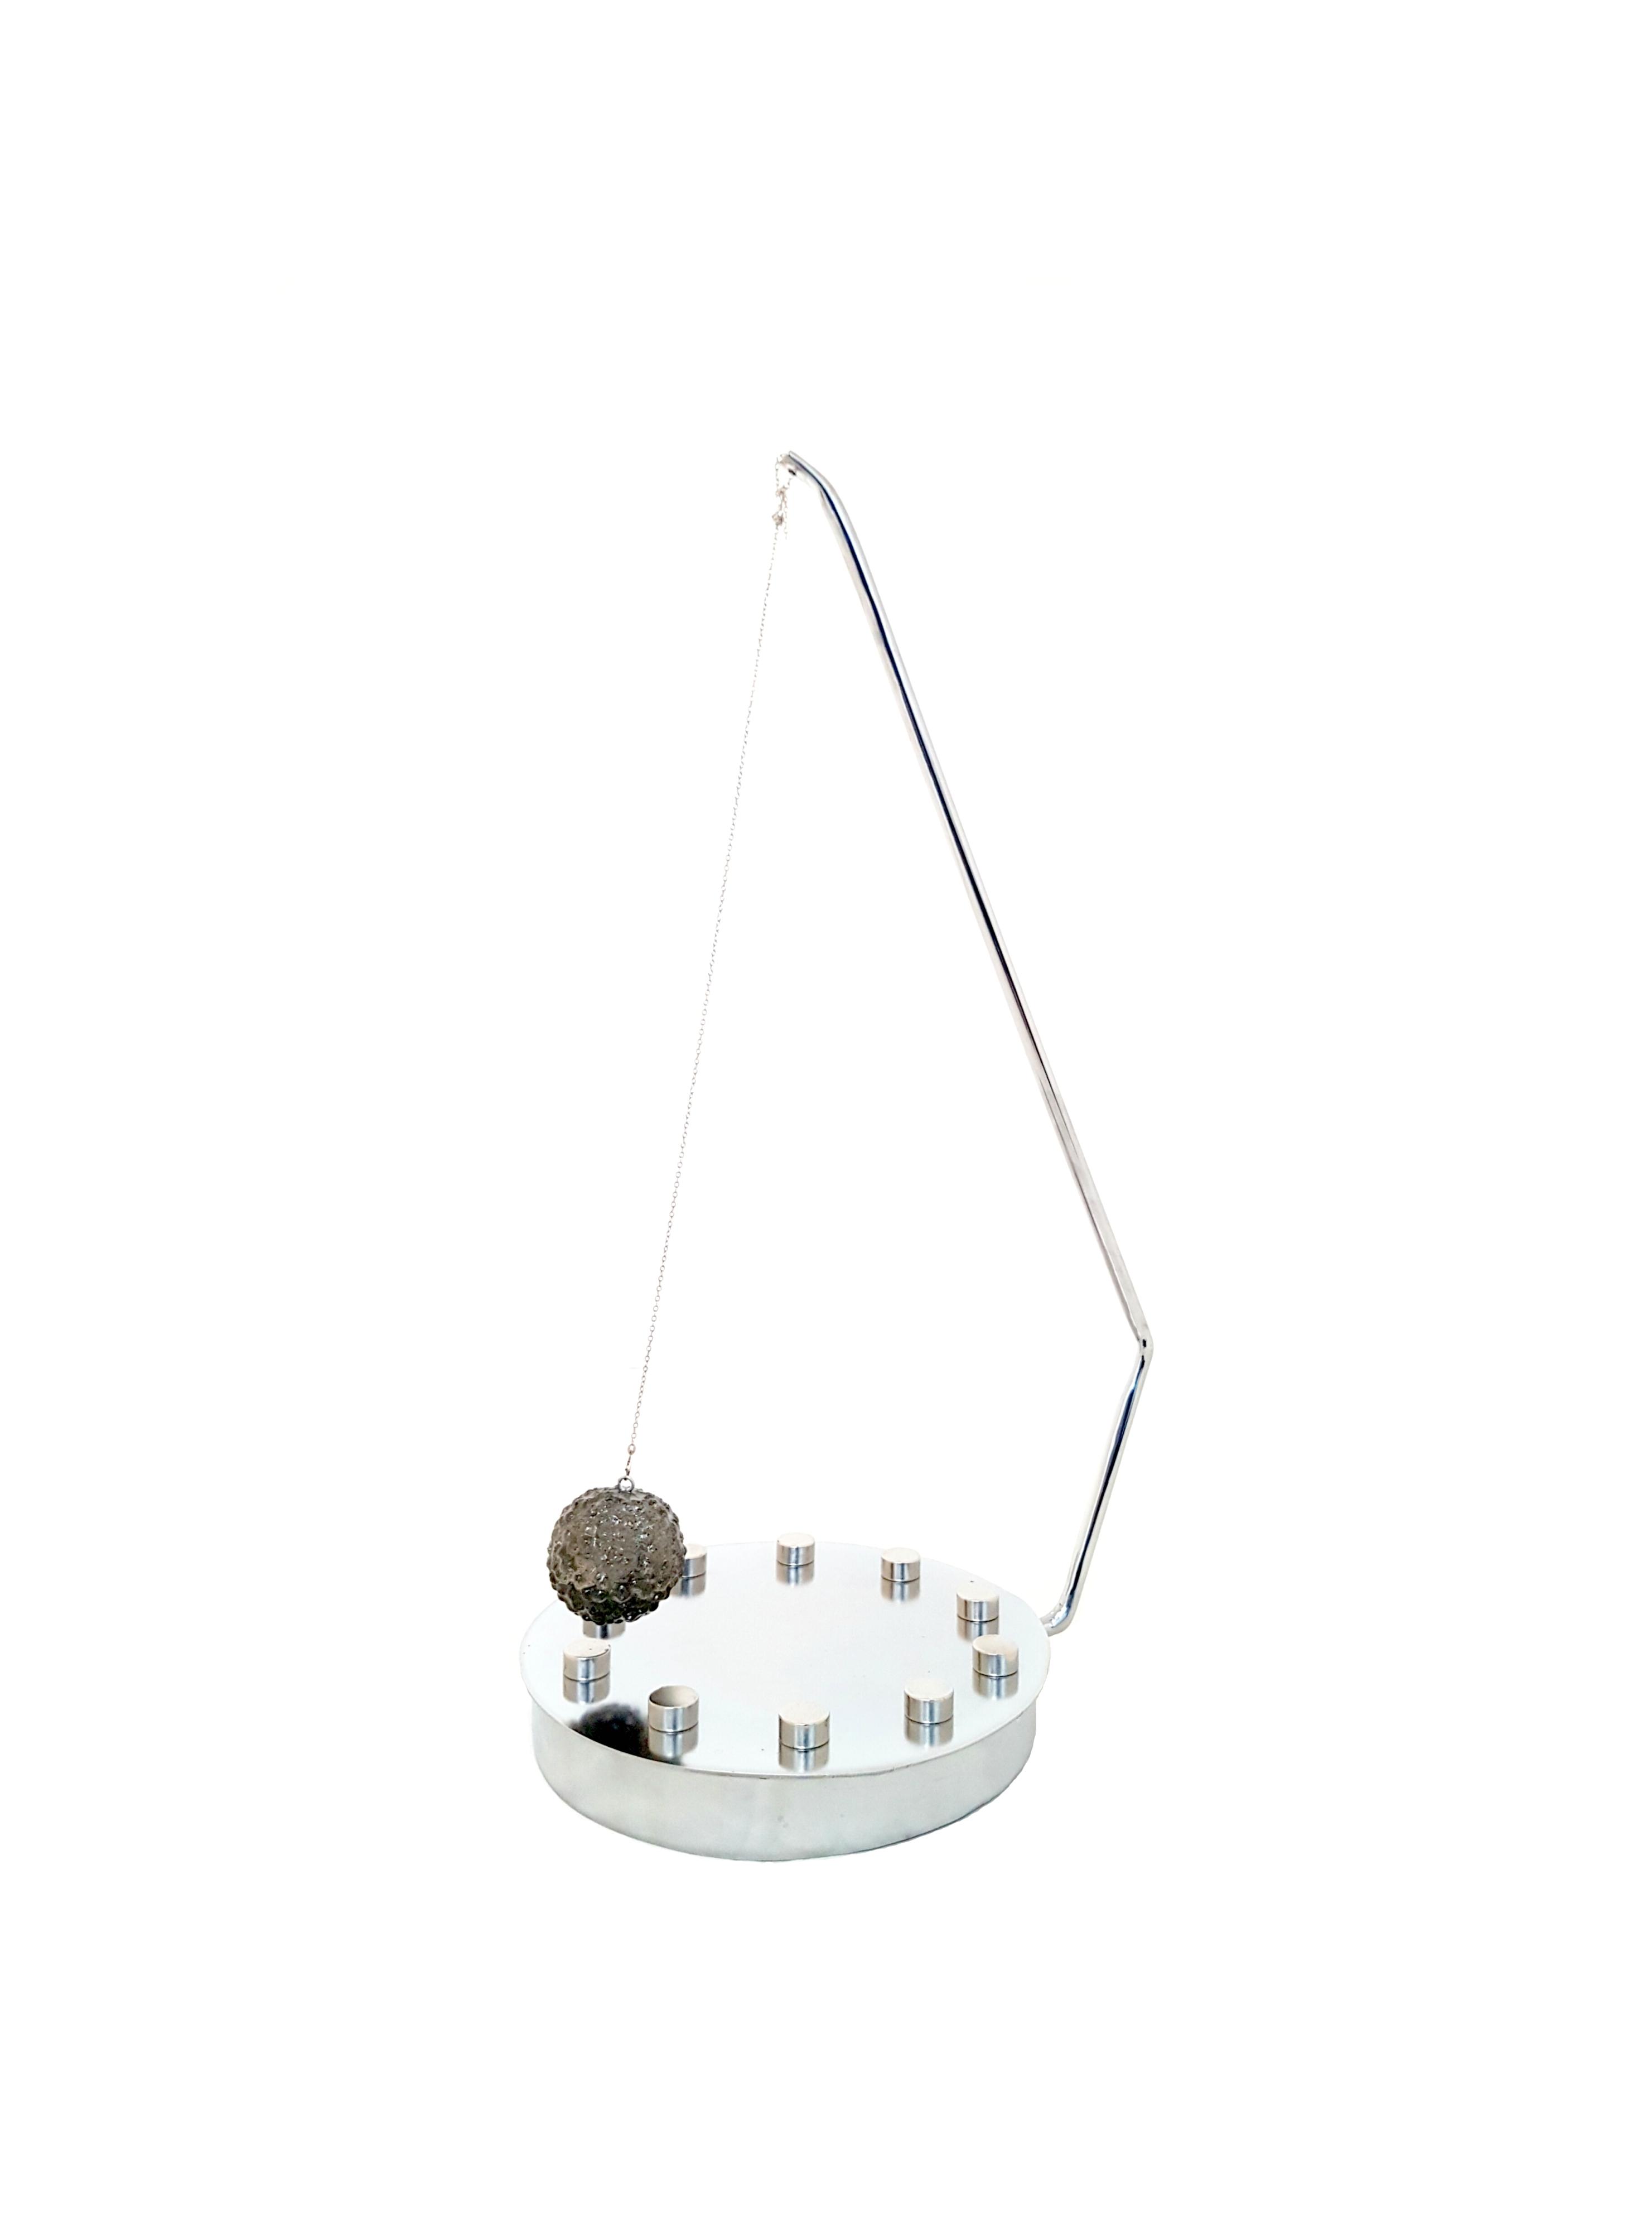 Untitled (Pendulum), 2016.